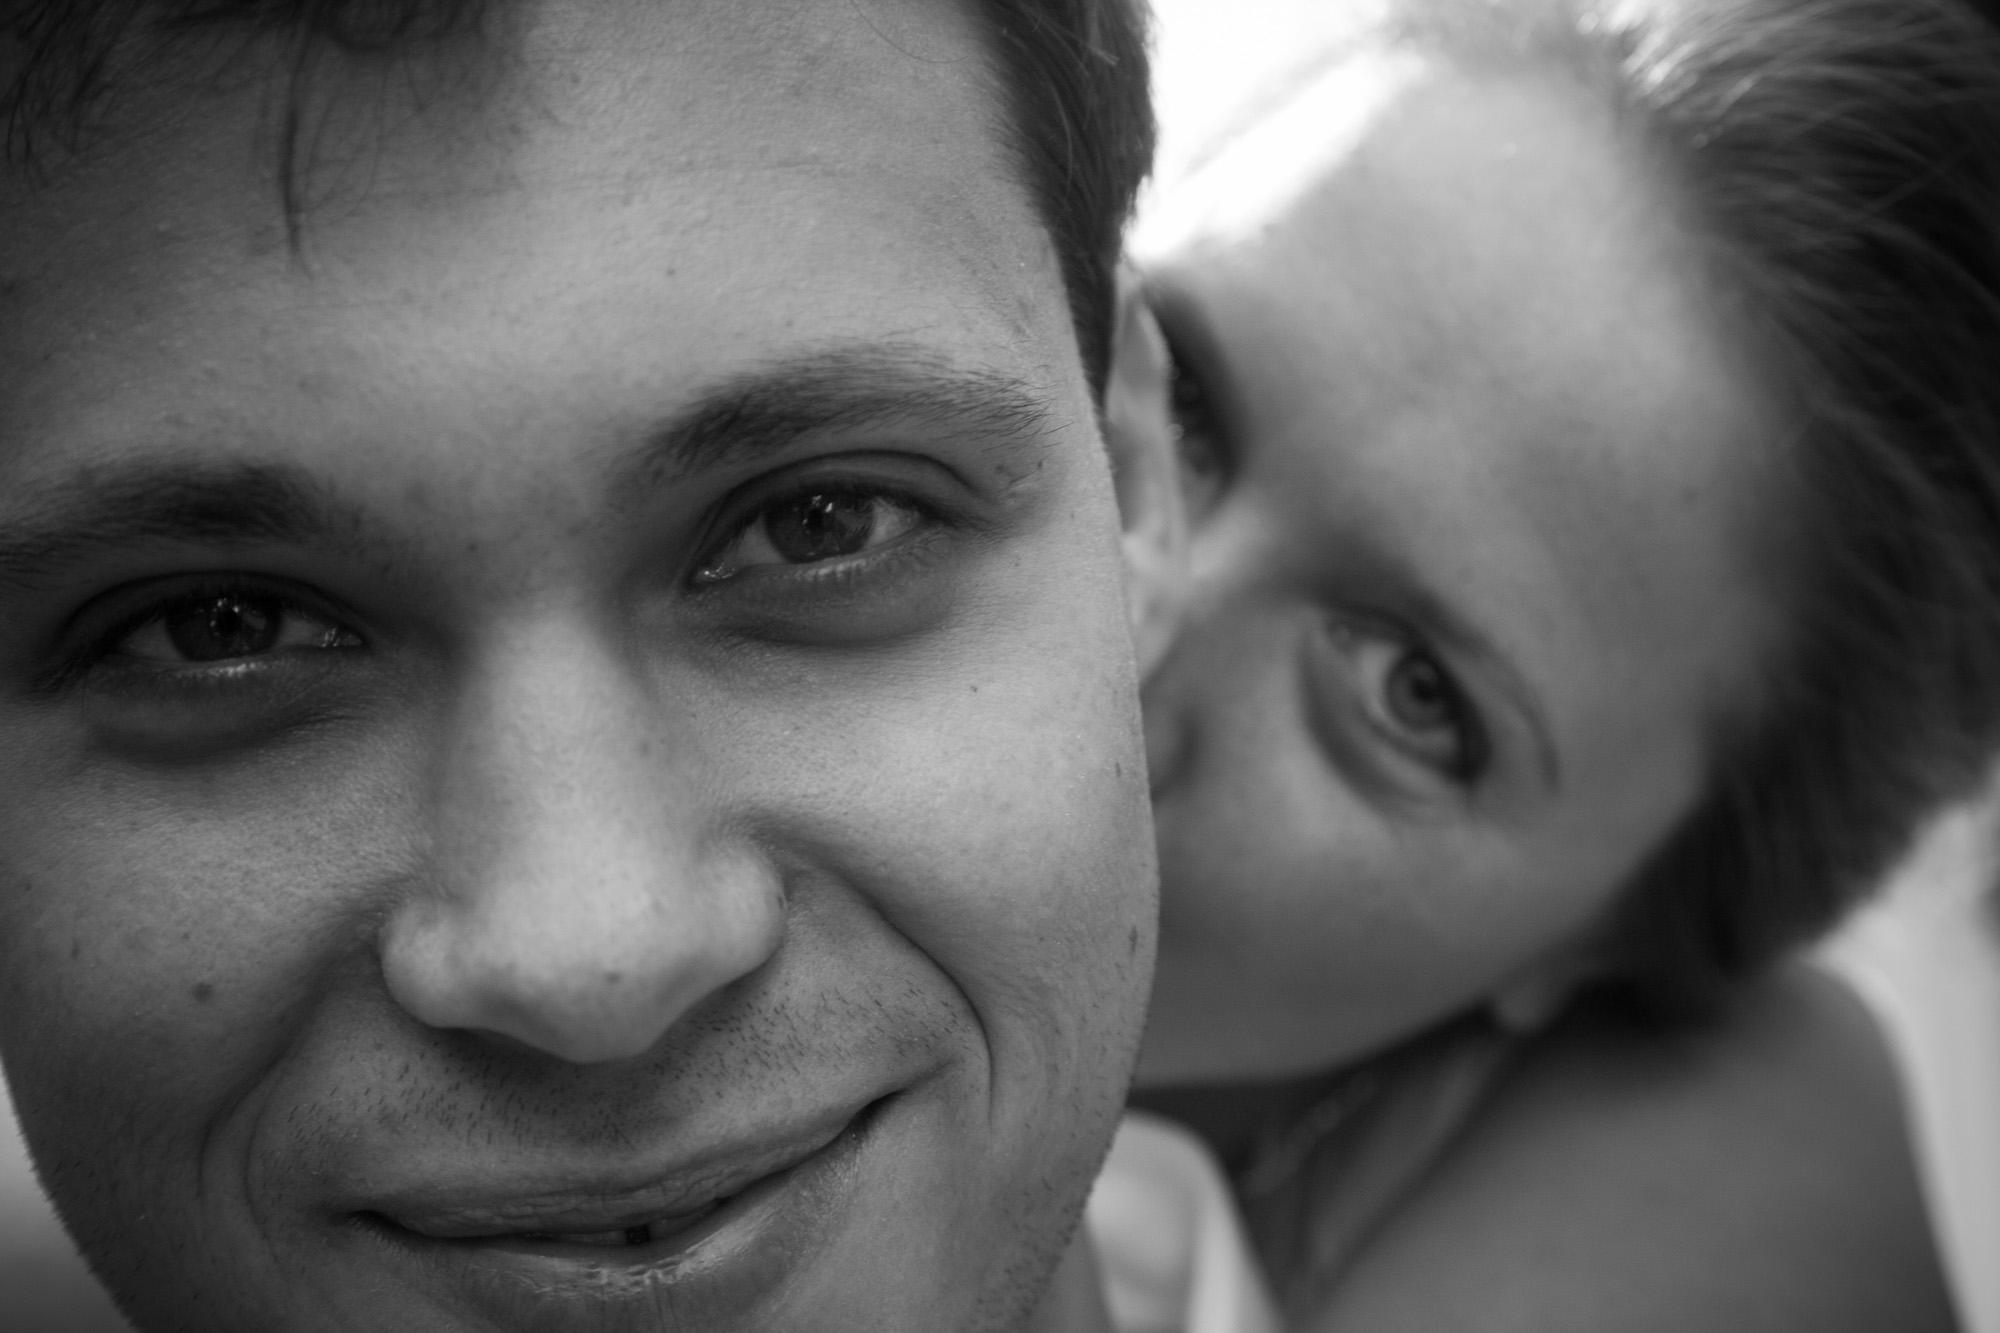 couples-love-photographer-oxford-london-jonathan-self-photography-9.jpg